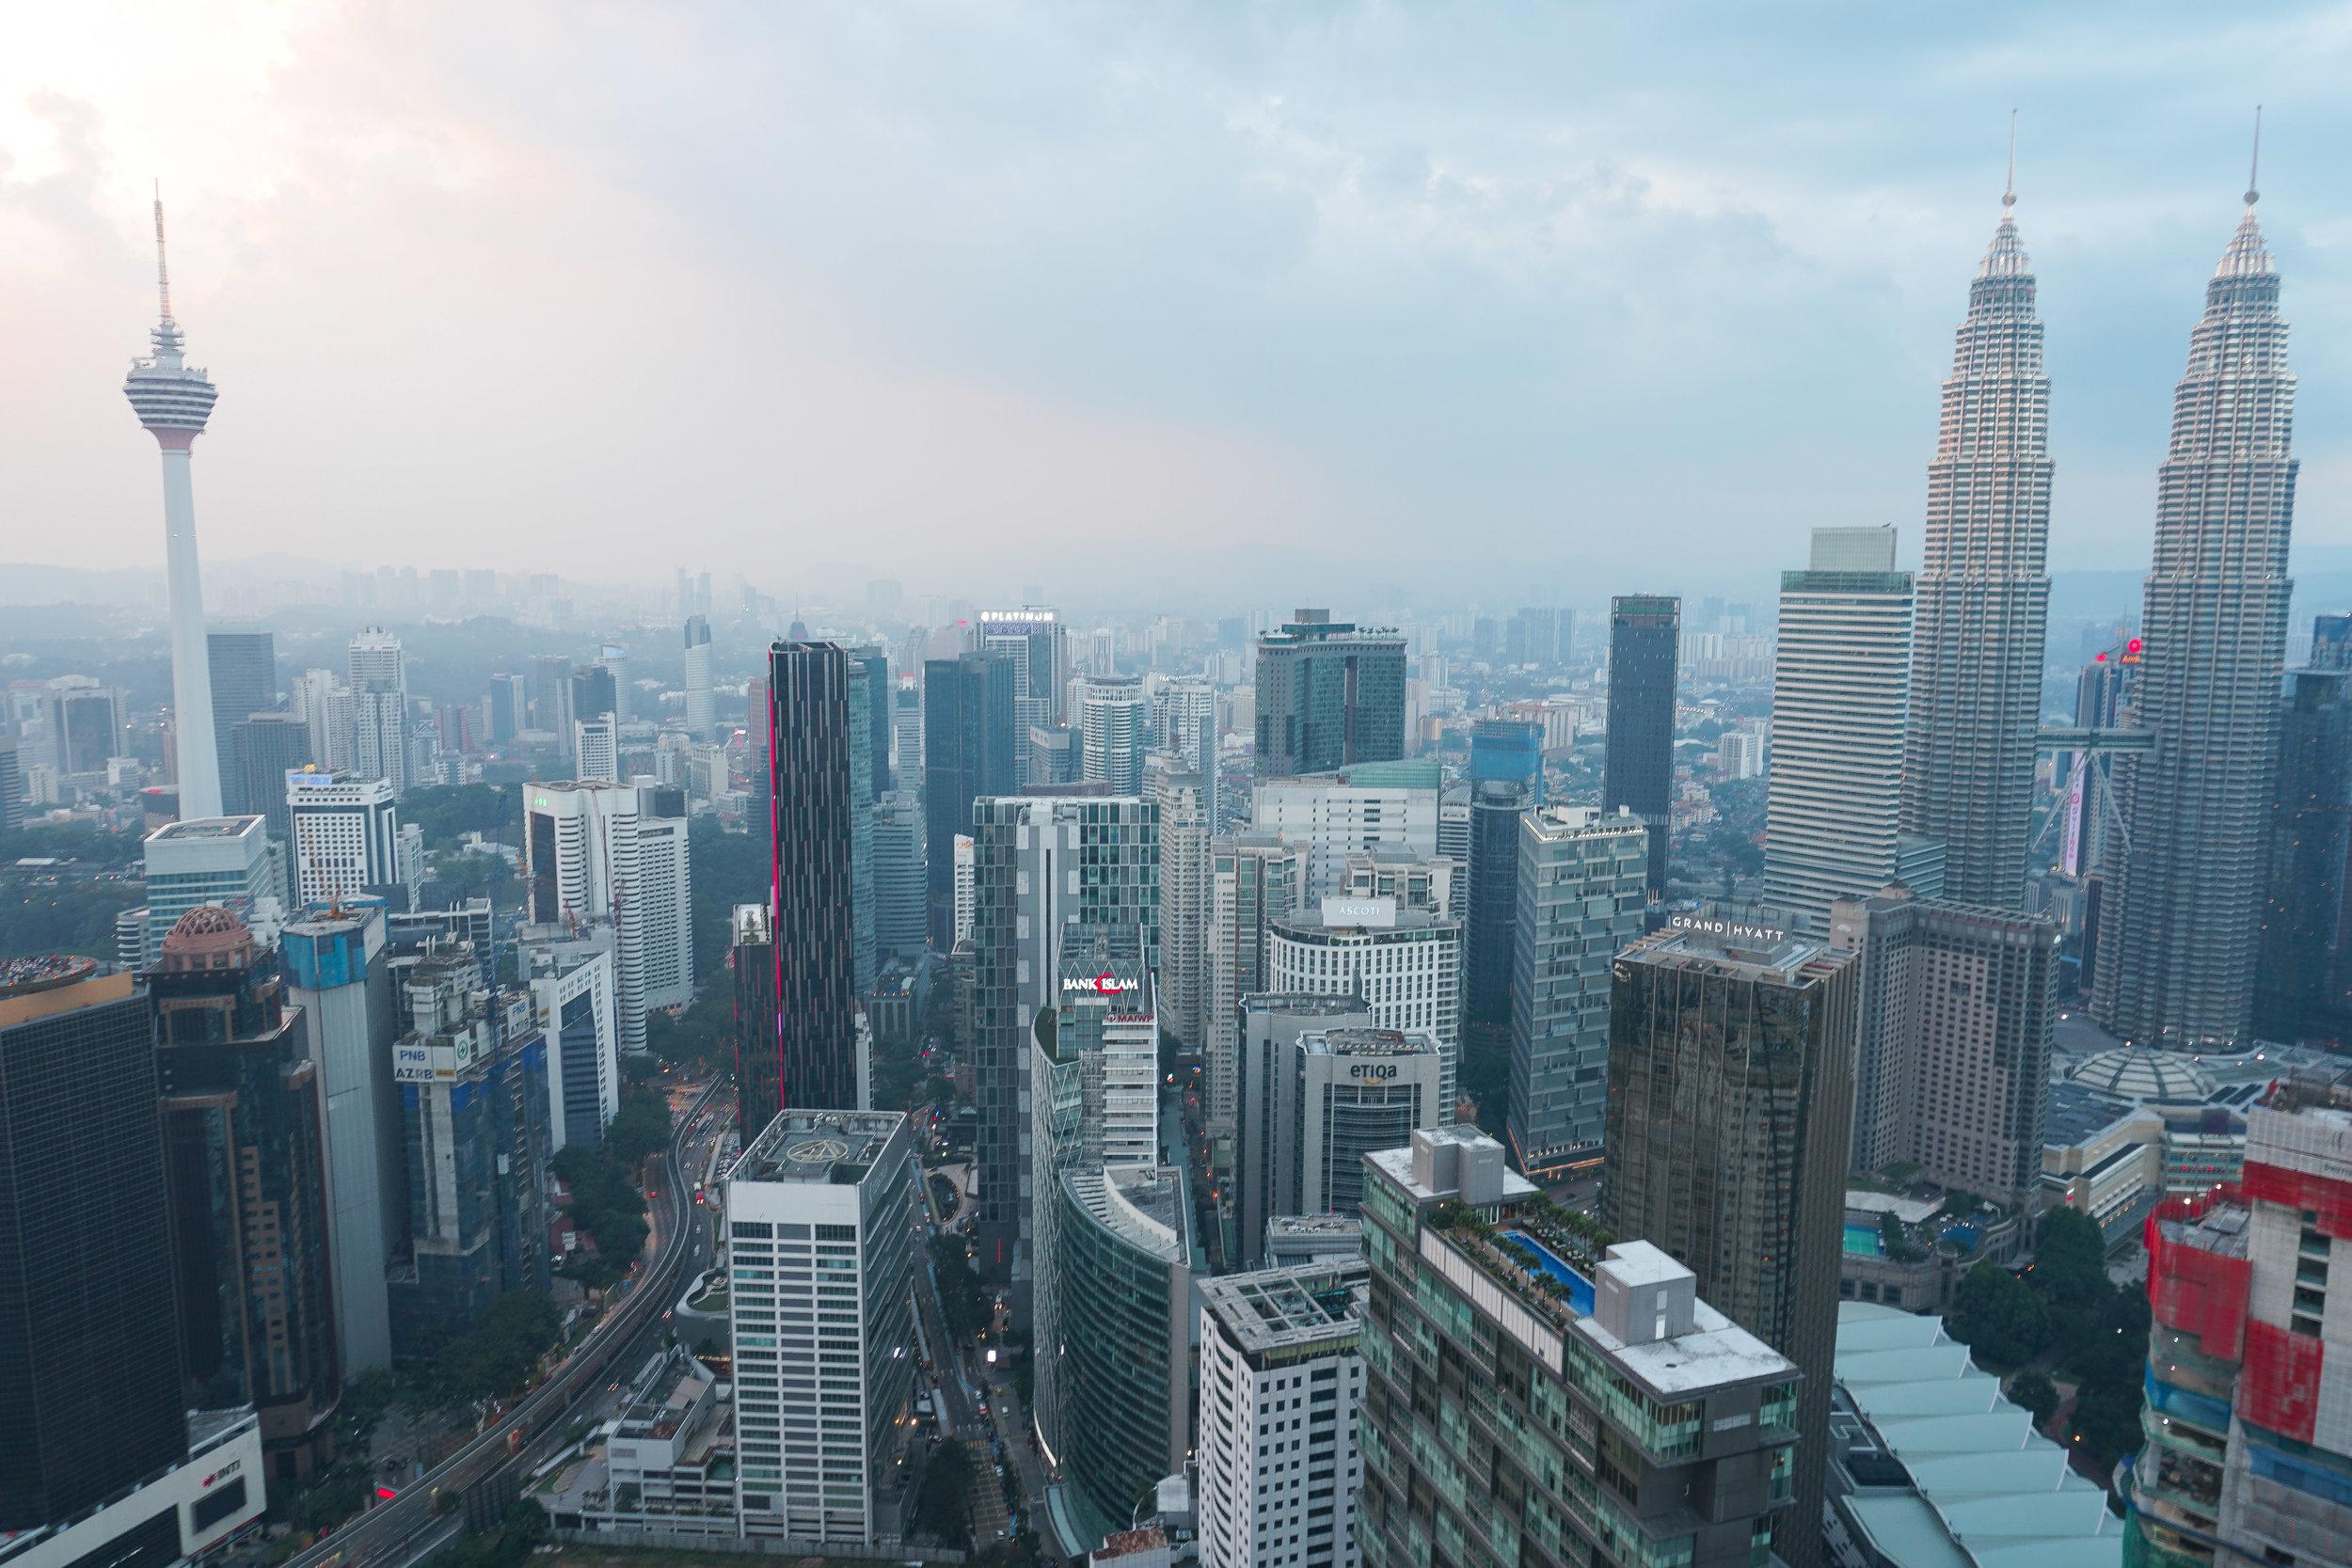 curio.trips.malaysia.kuala.lumpur.downtown.view.dusk.landscape.jpg